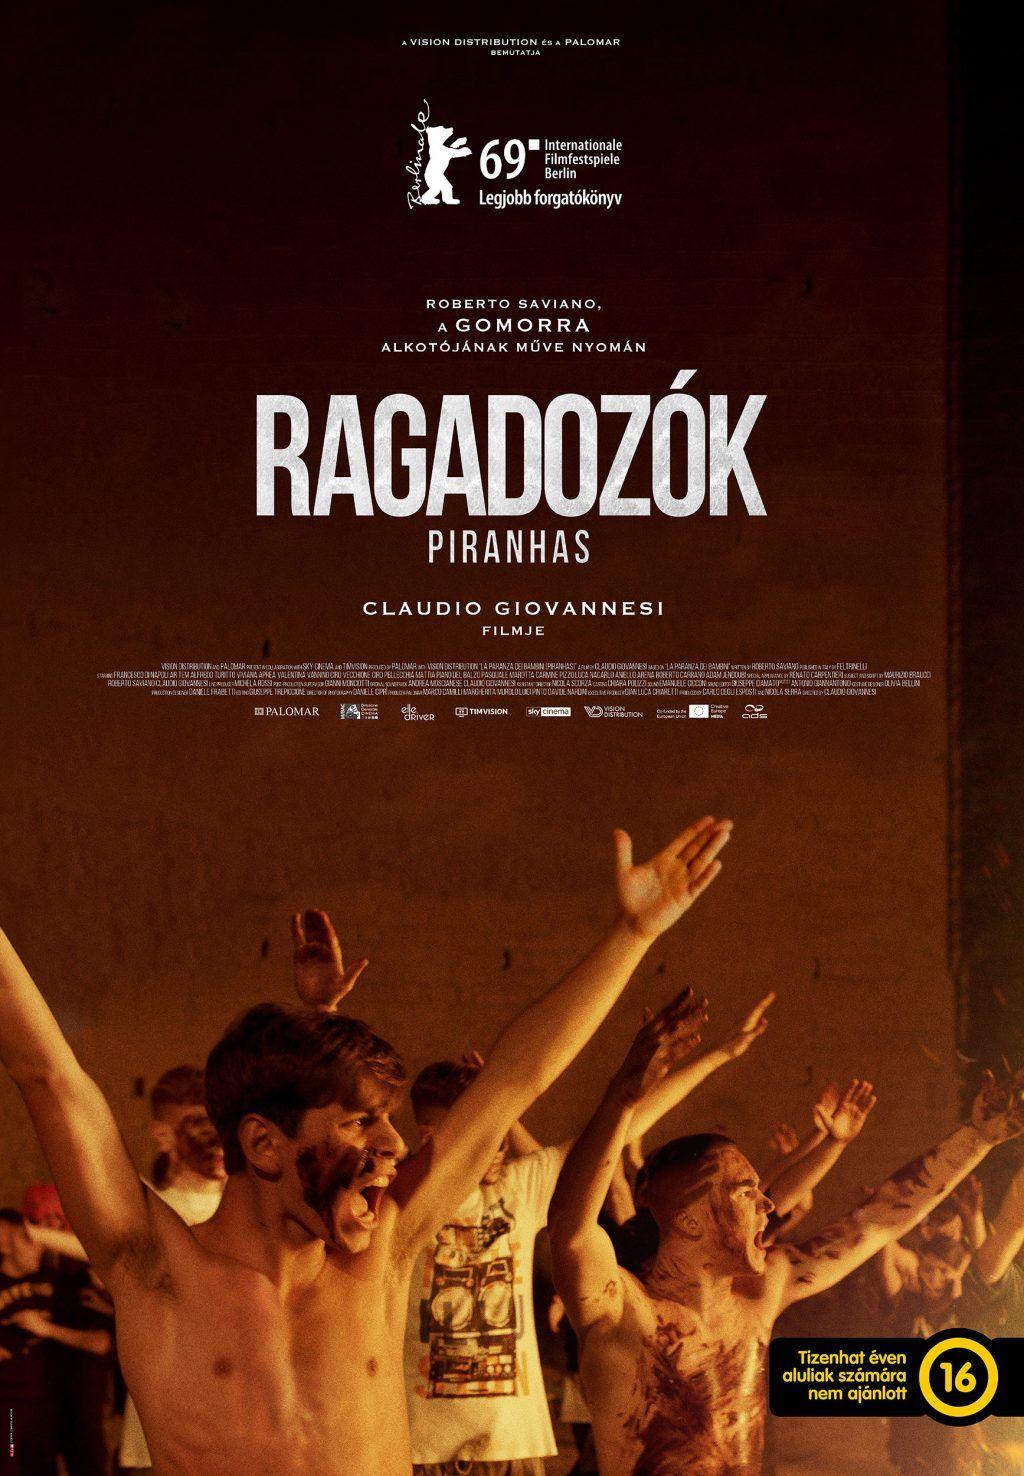 Ragadozok Piranhas La Paranza Dei Bambini 2019 Film Films Complets Film Streaming Vf